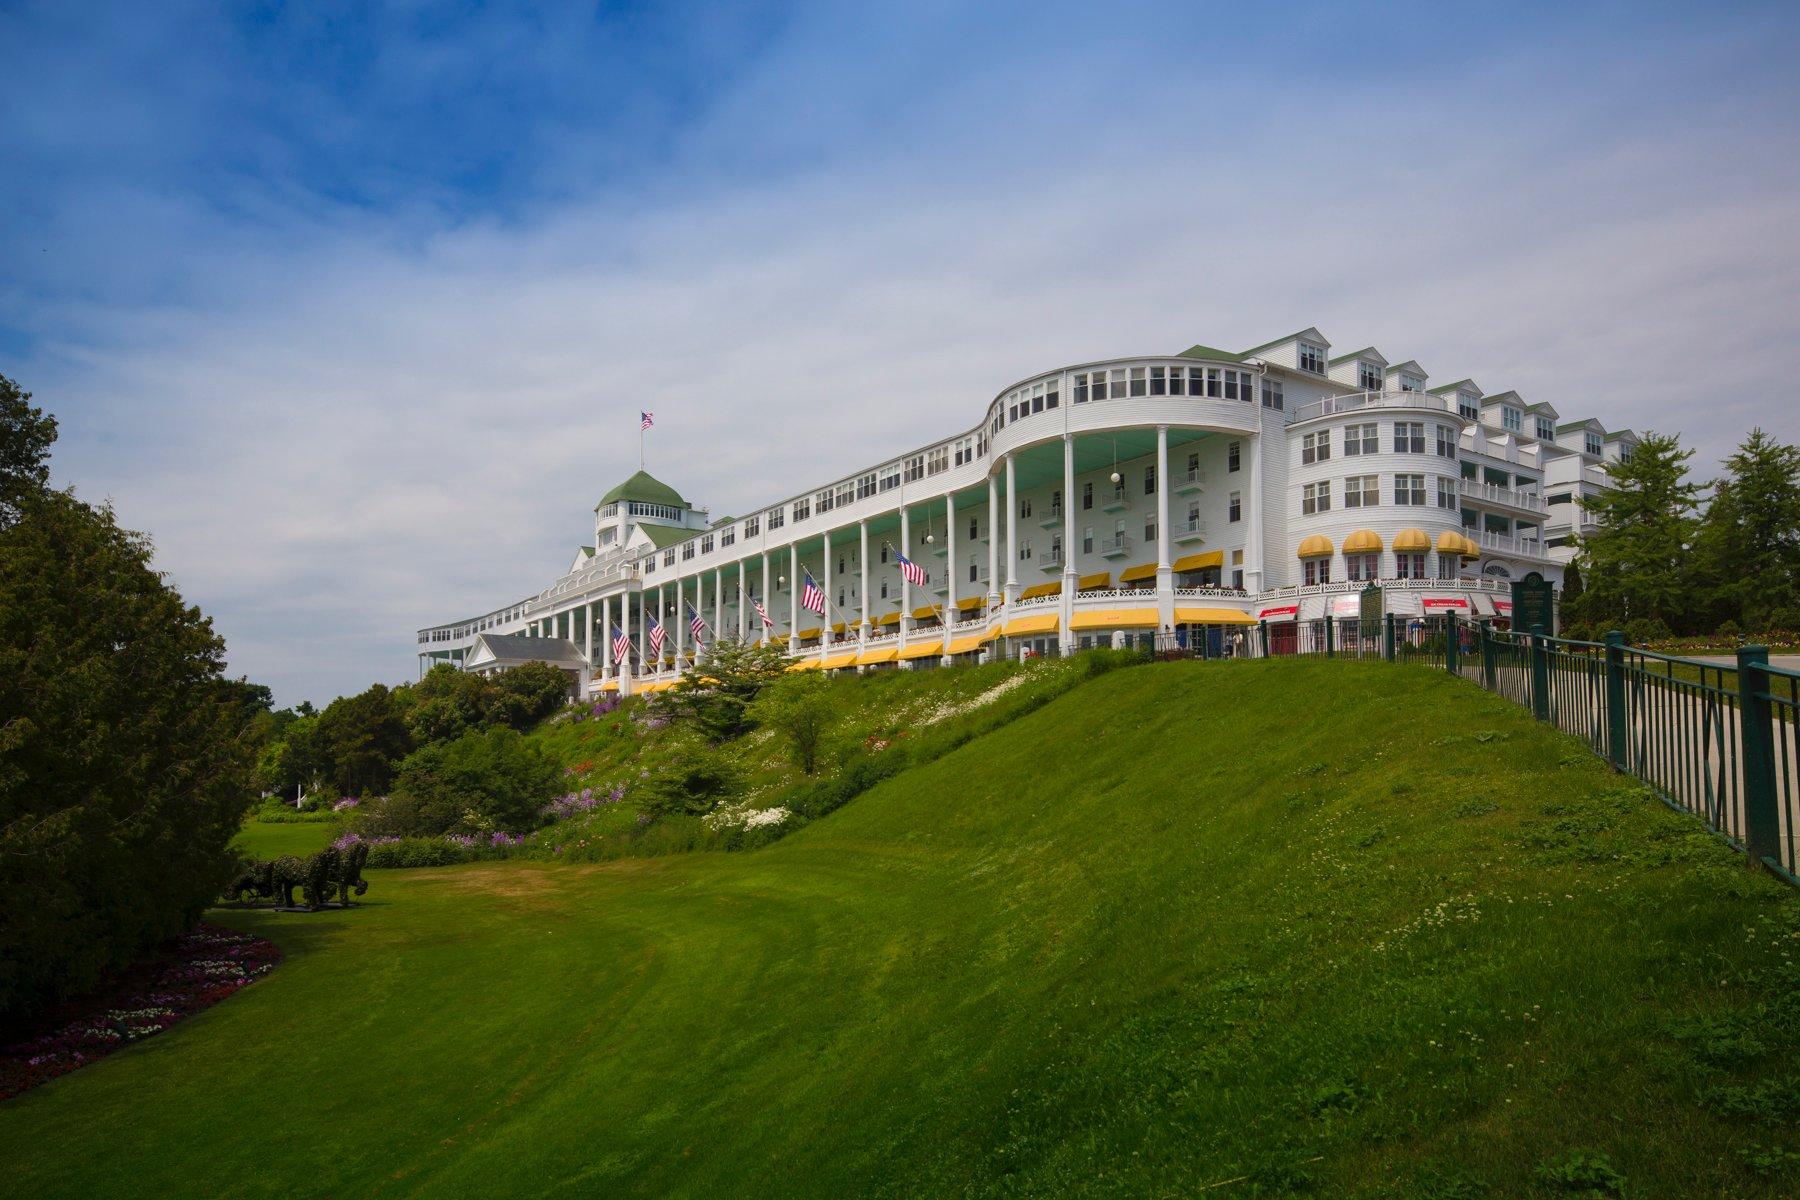 Grand hotel on mackinac island, michigan - all inclusive in usa